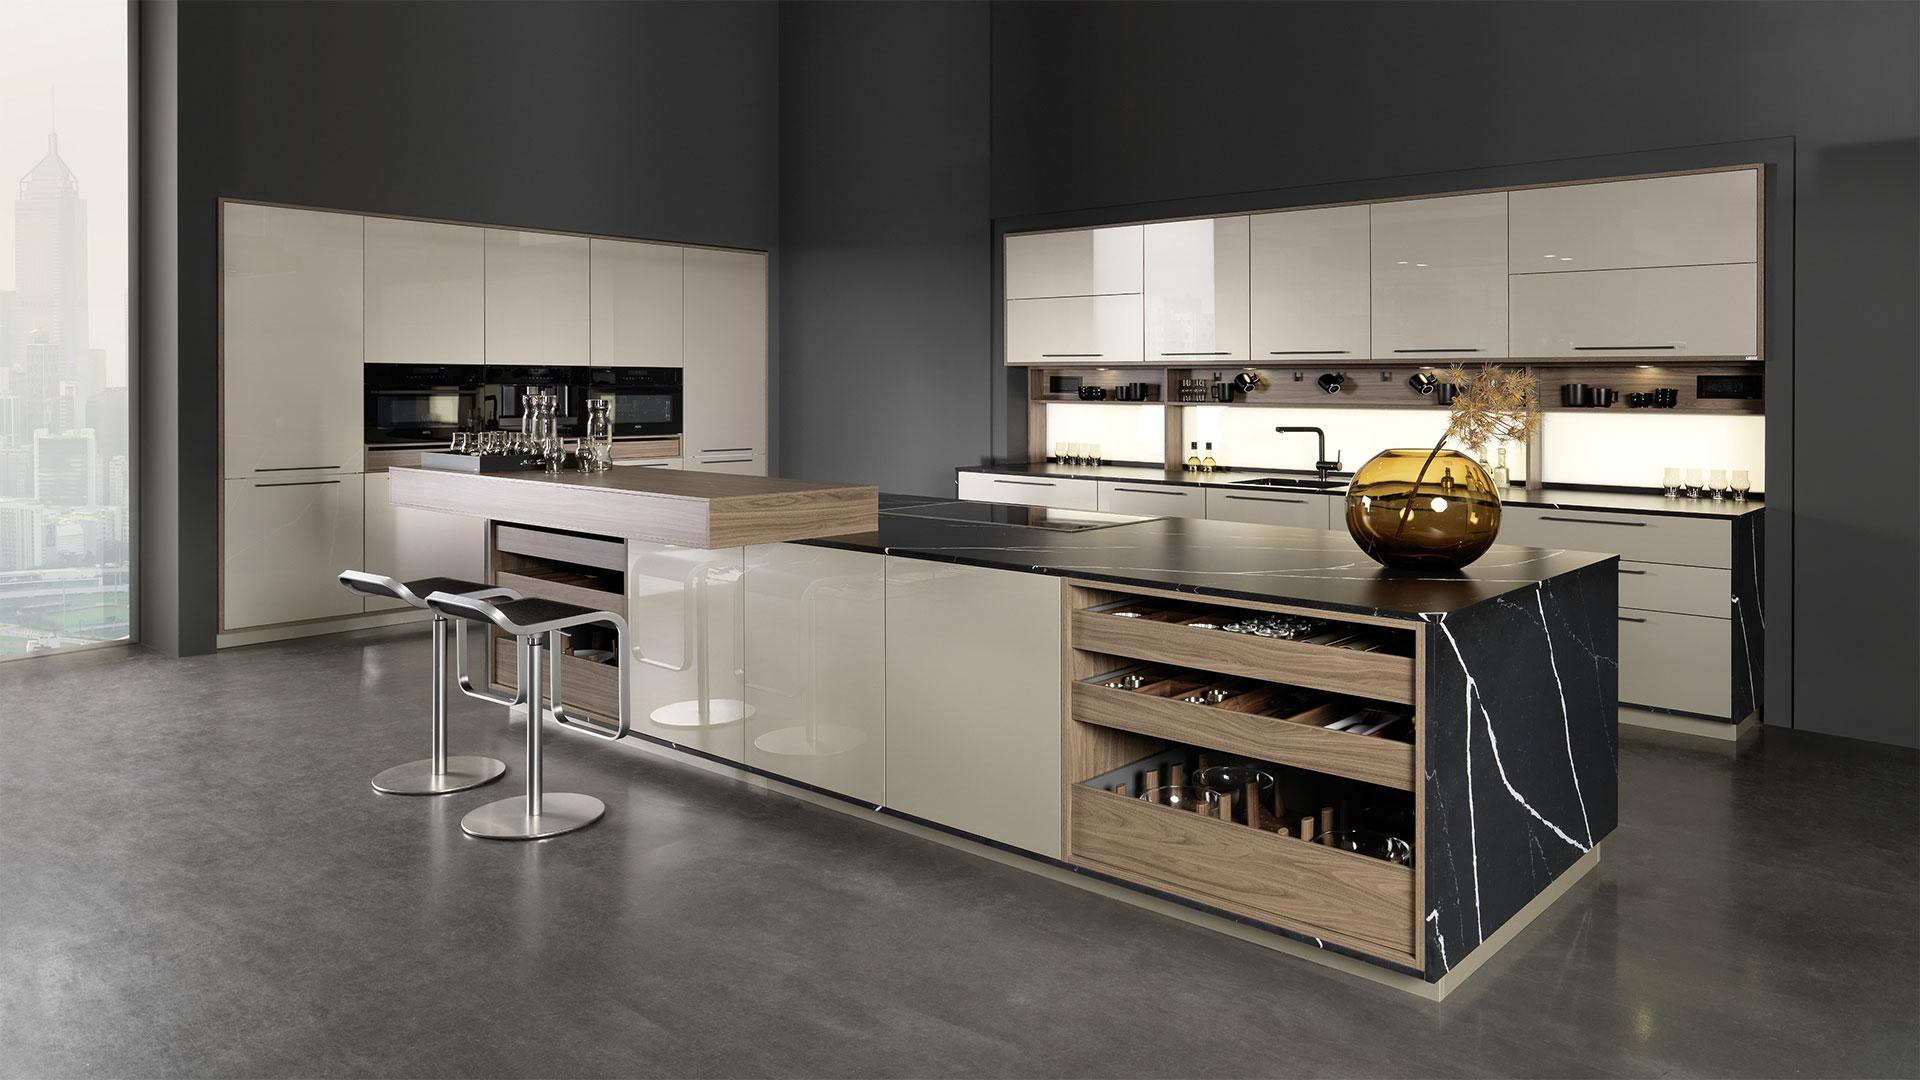 دکوراسیون آشپزخانه با رنگ خاکستری مدرن